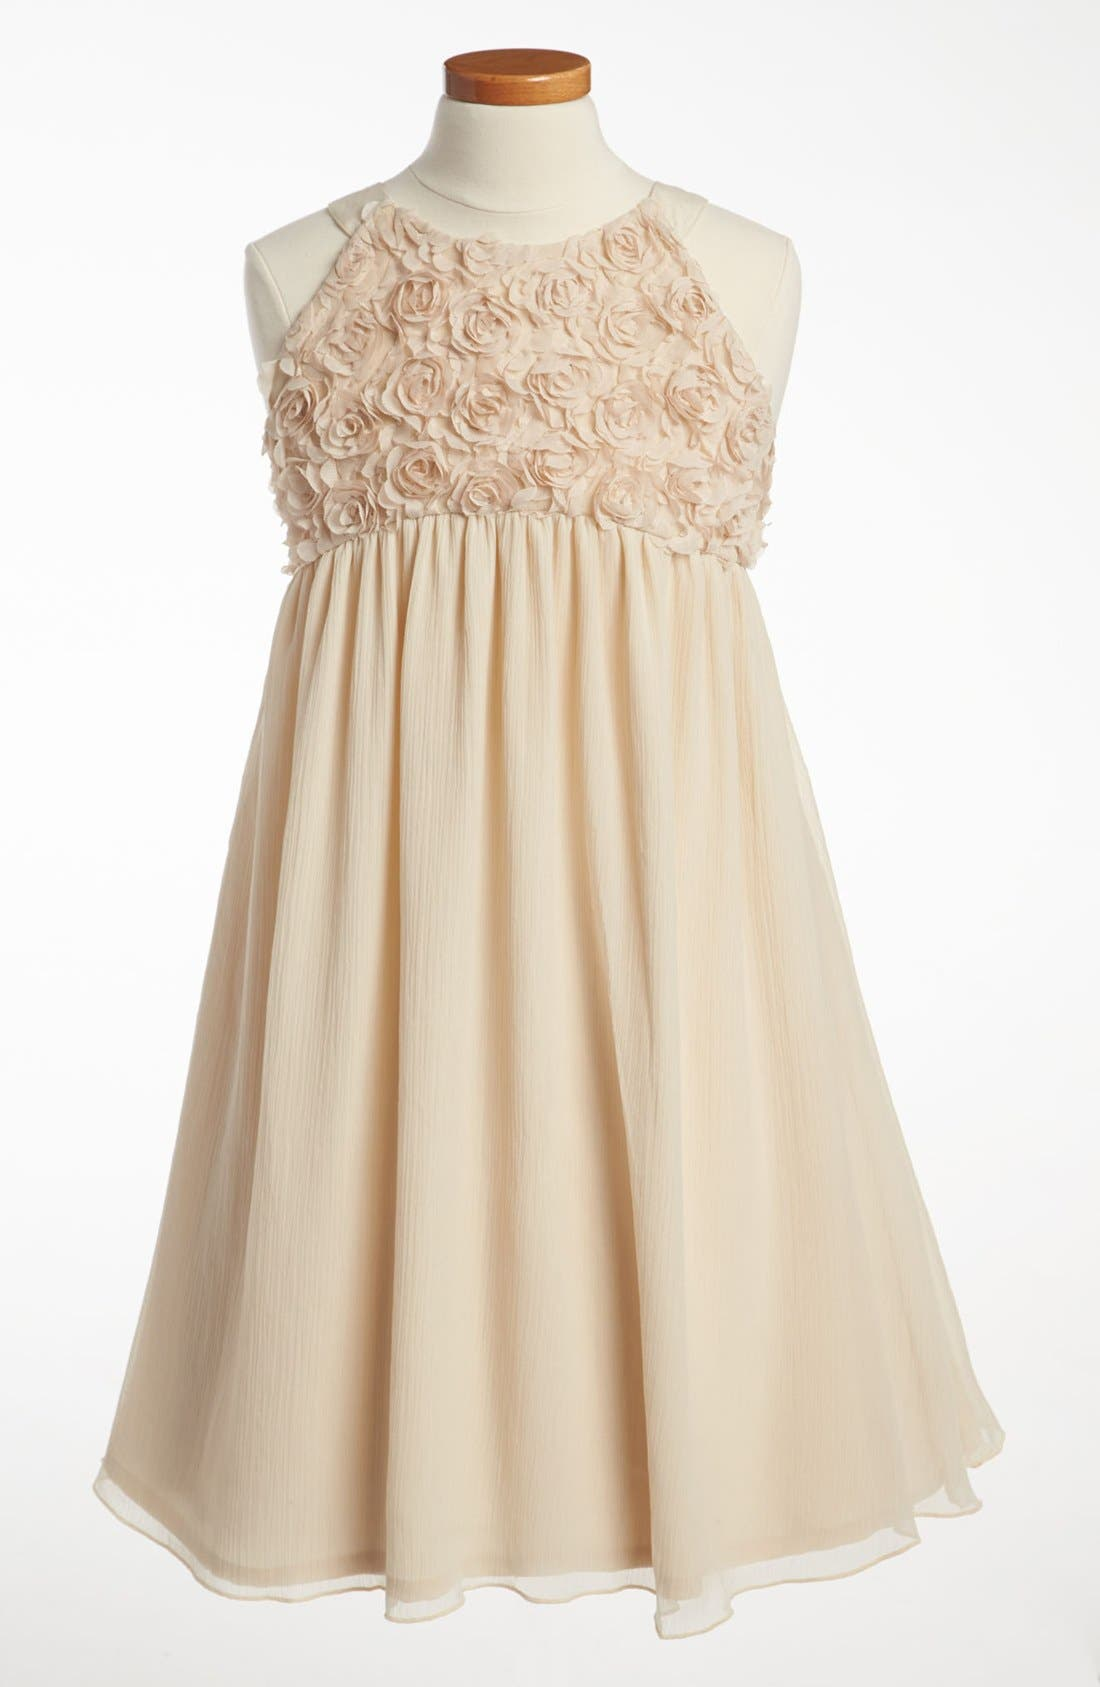 Alternate Image 1 Selected - Ruby & Bloom 'Selma' Dress (Big Girls)